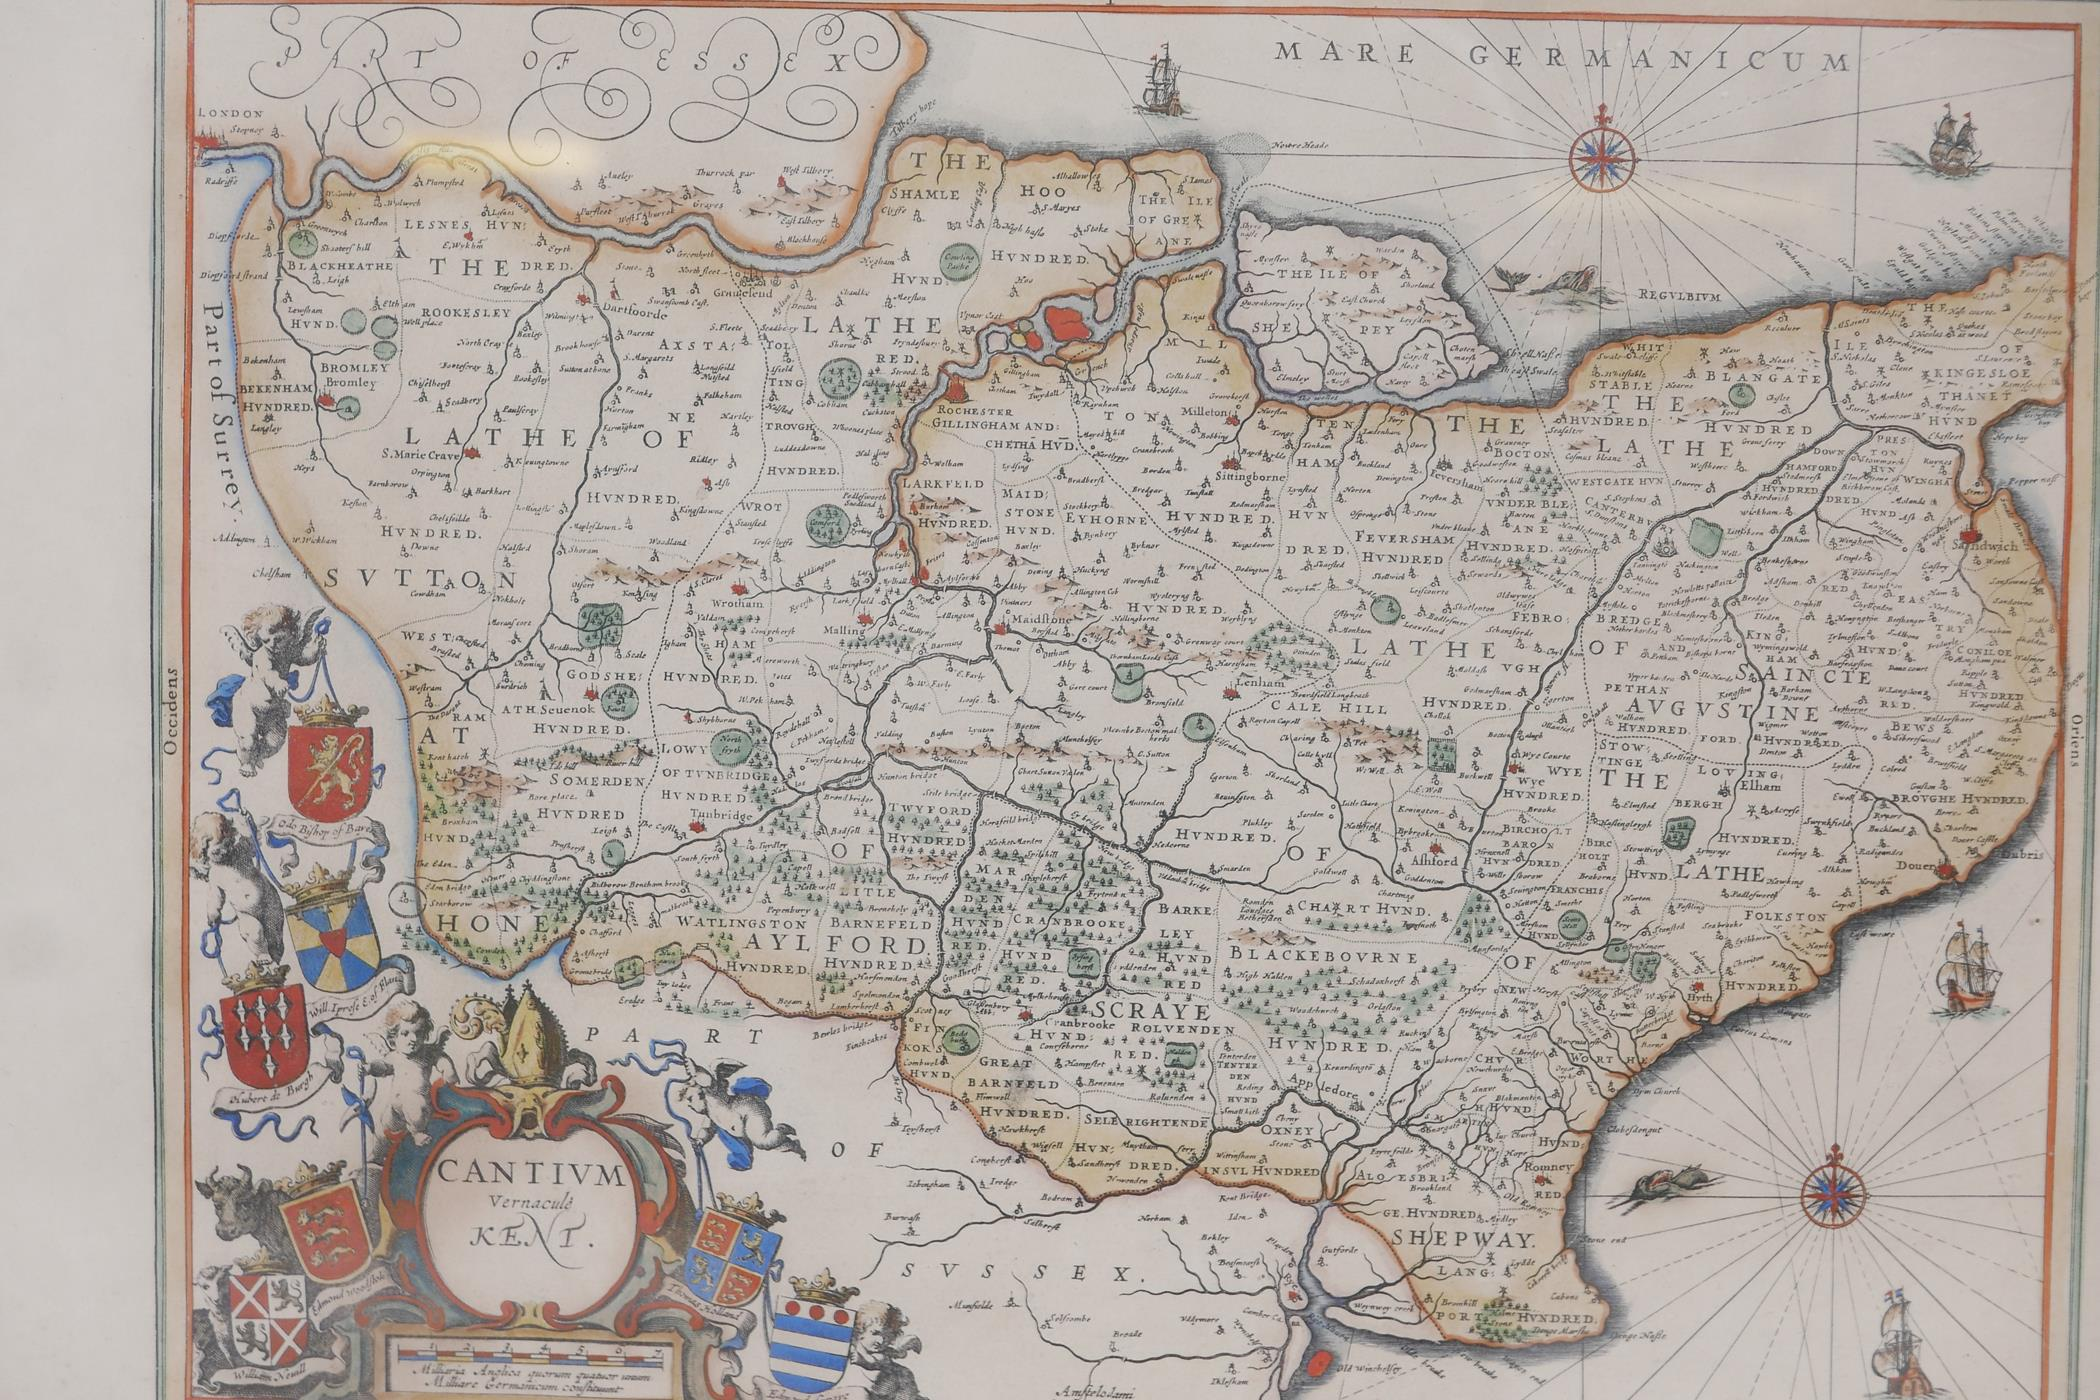 Map of Kent, Cantium vernacule Kent, and another of Surrey, Surria vernacule Surrey, both hand - Image 4 of 5